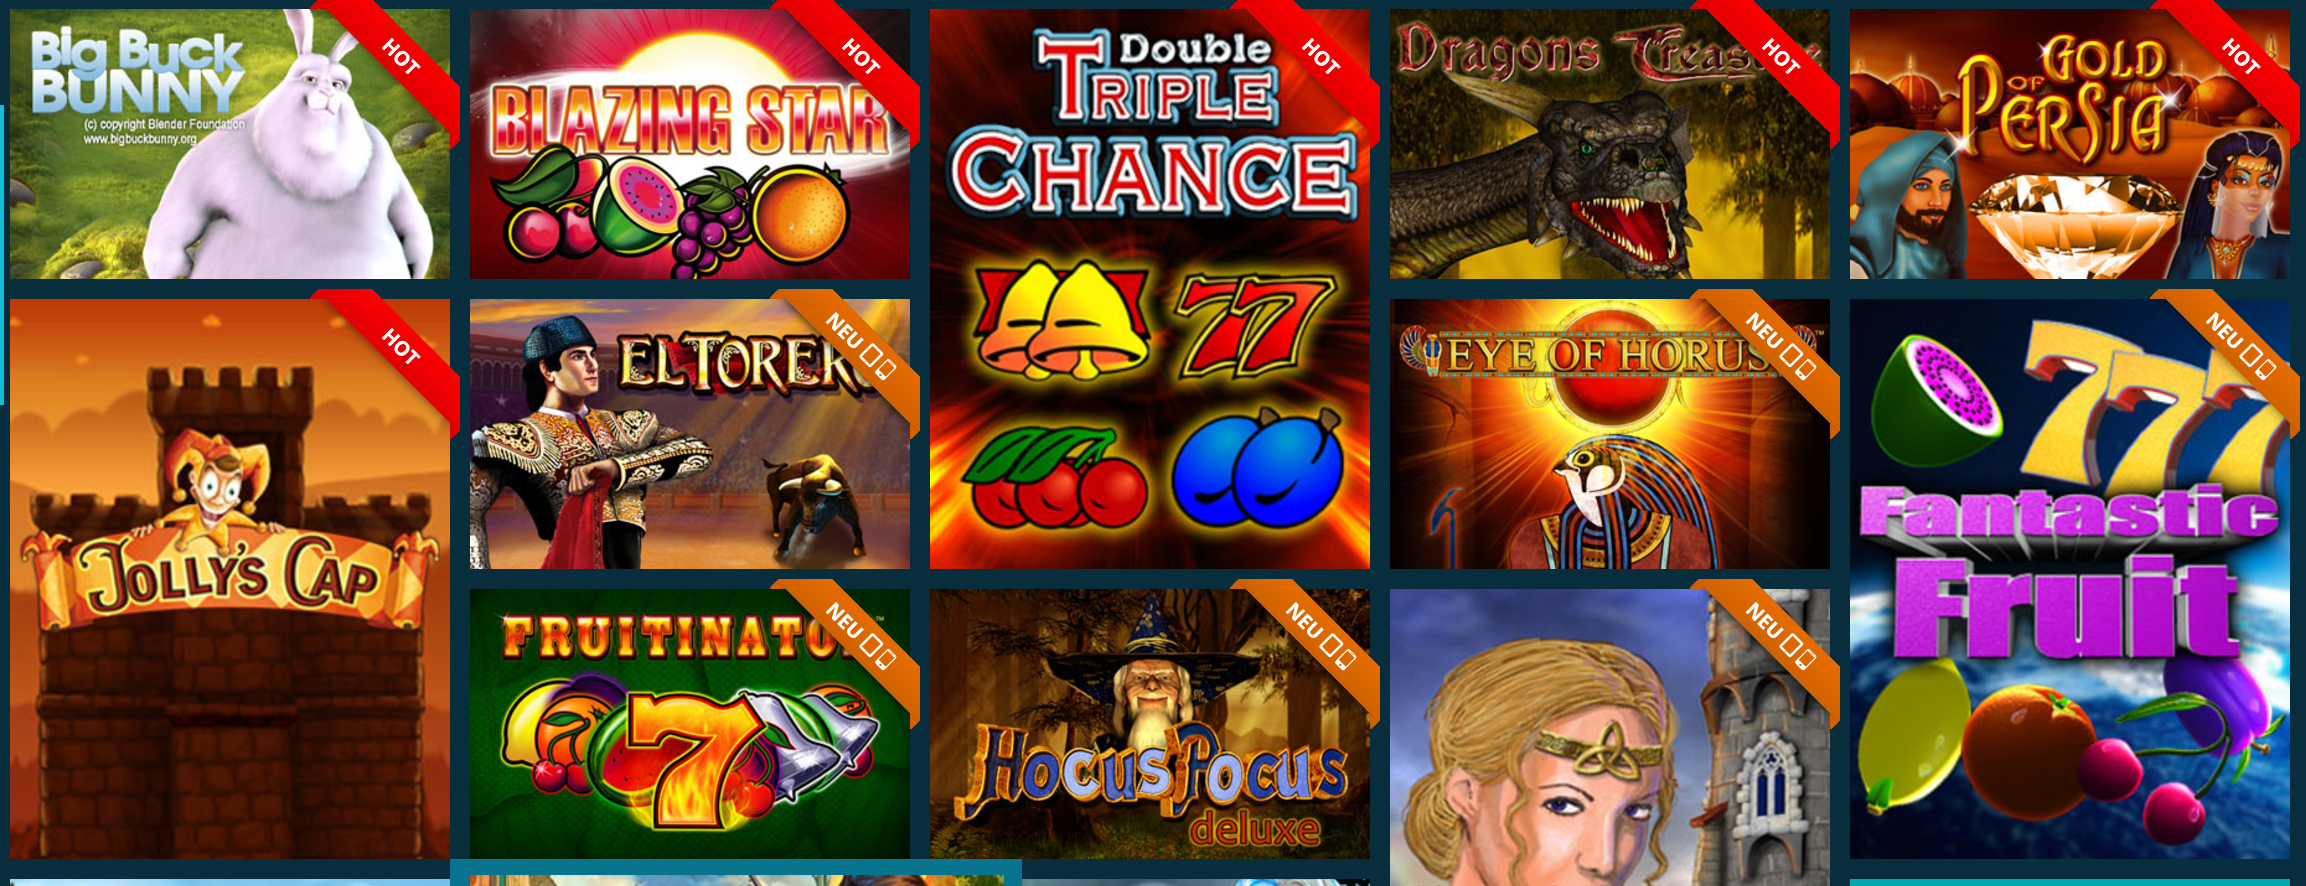 Merkur Casino Online Bonus